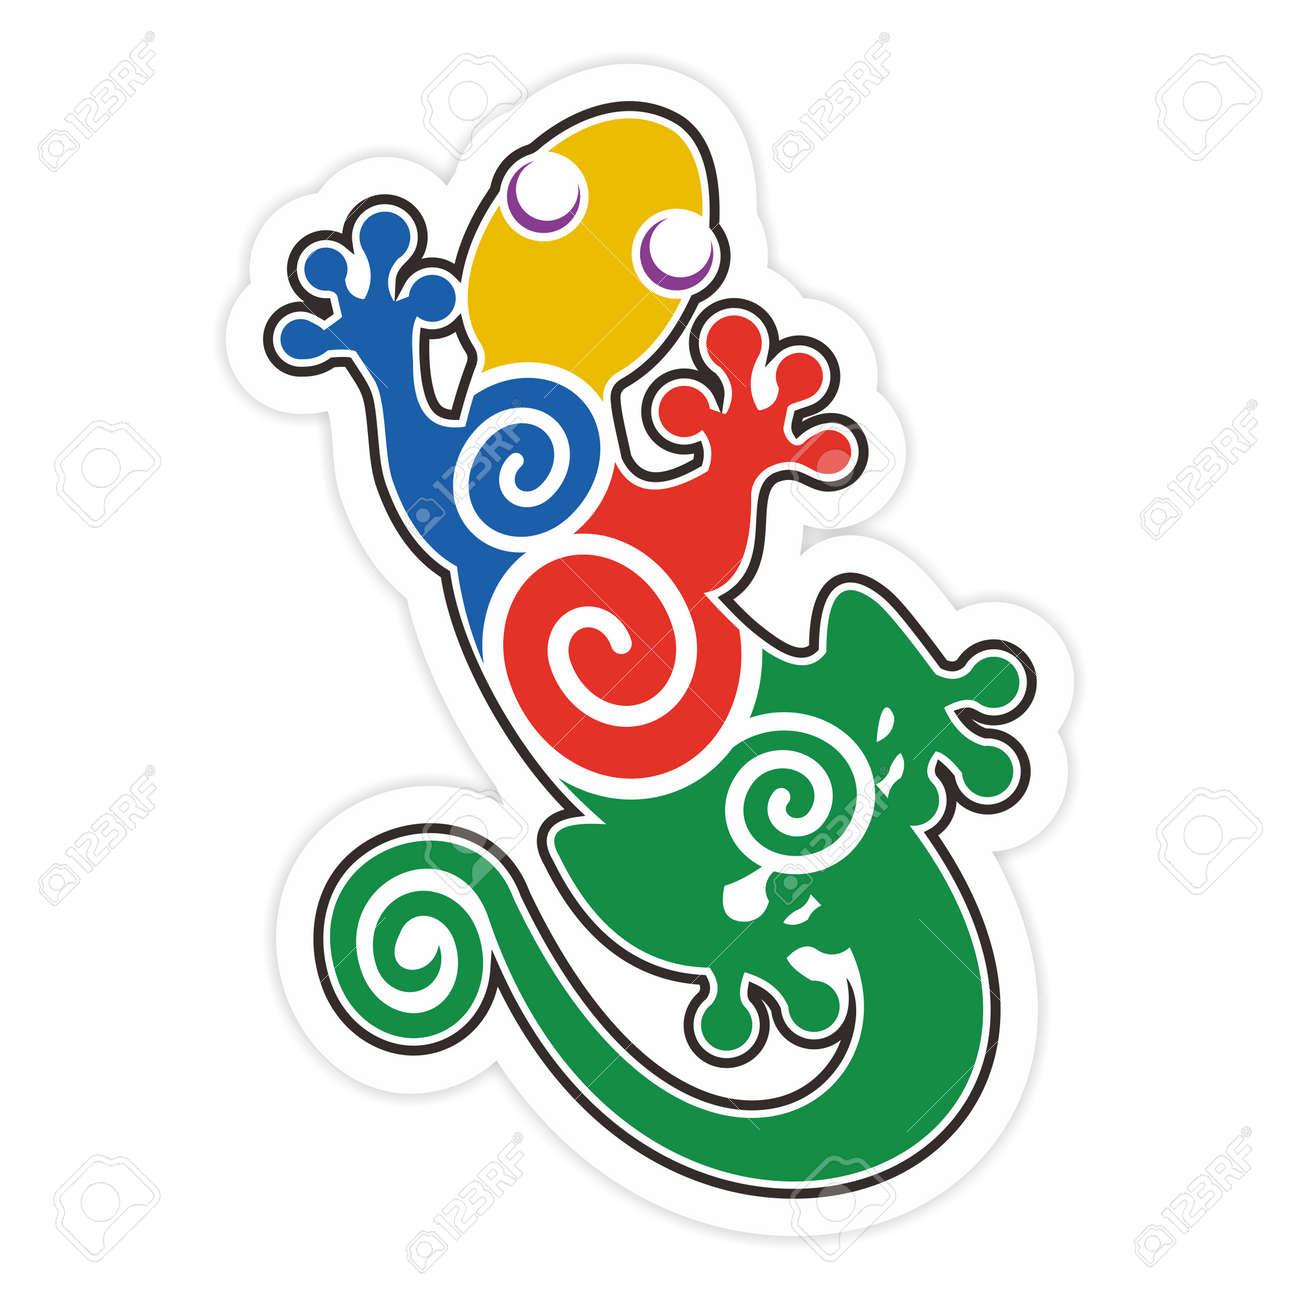 vector artistic colorful salamander silhouette illustration